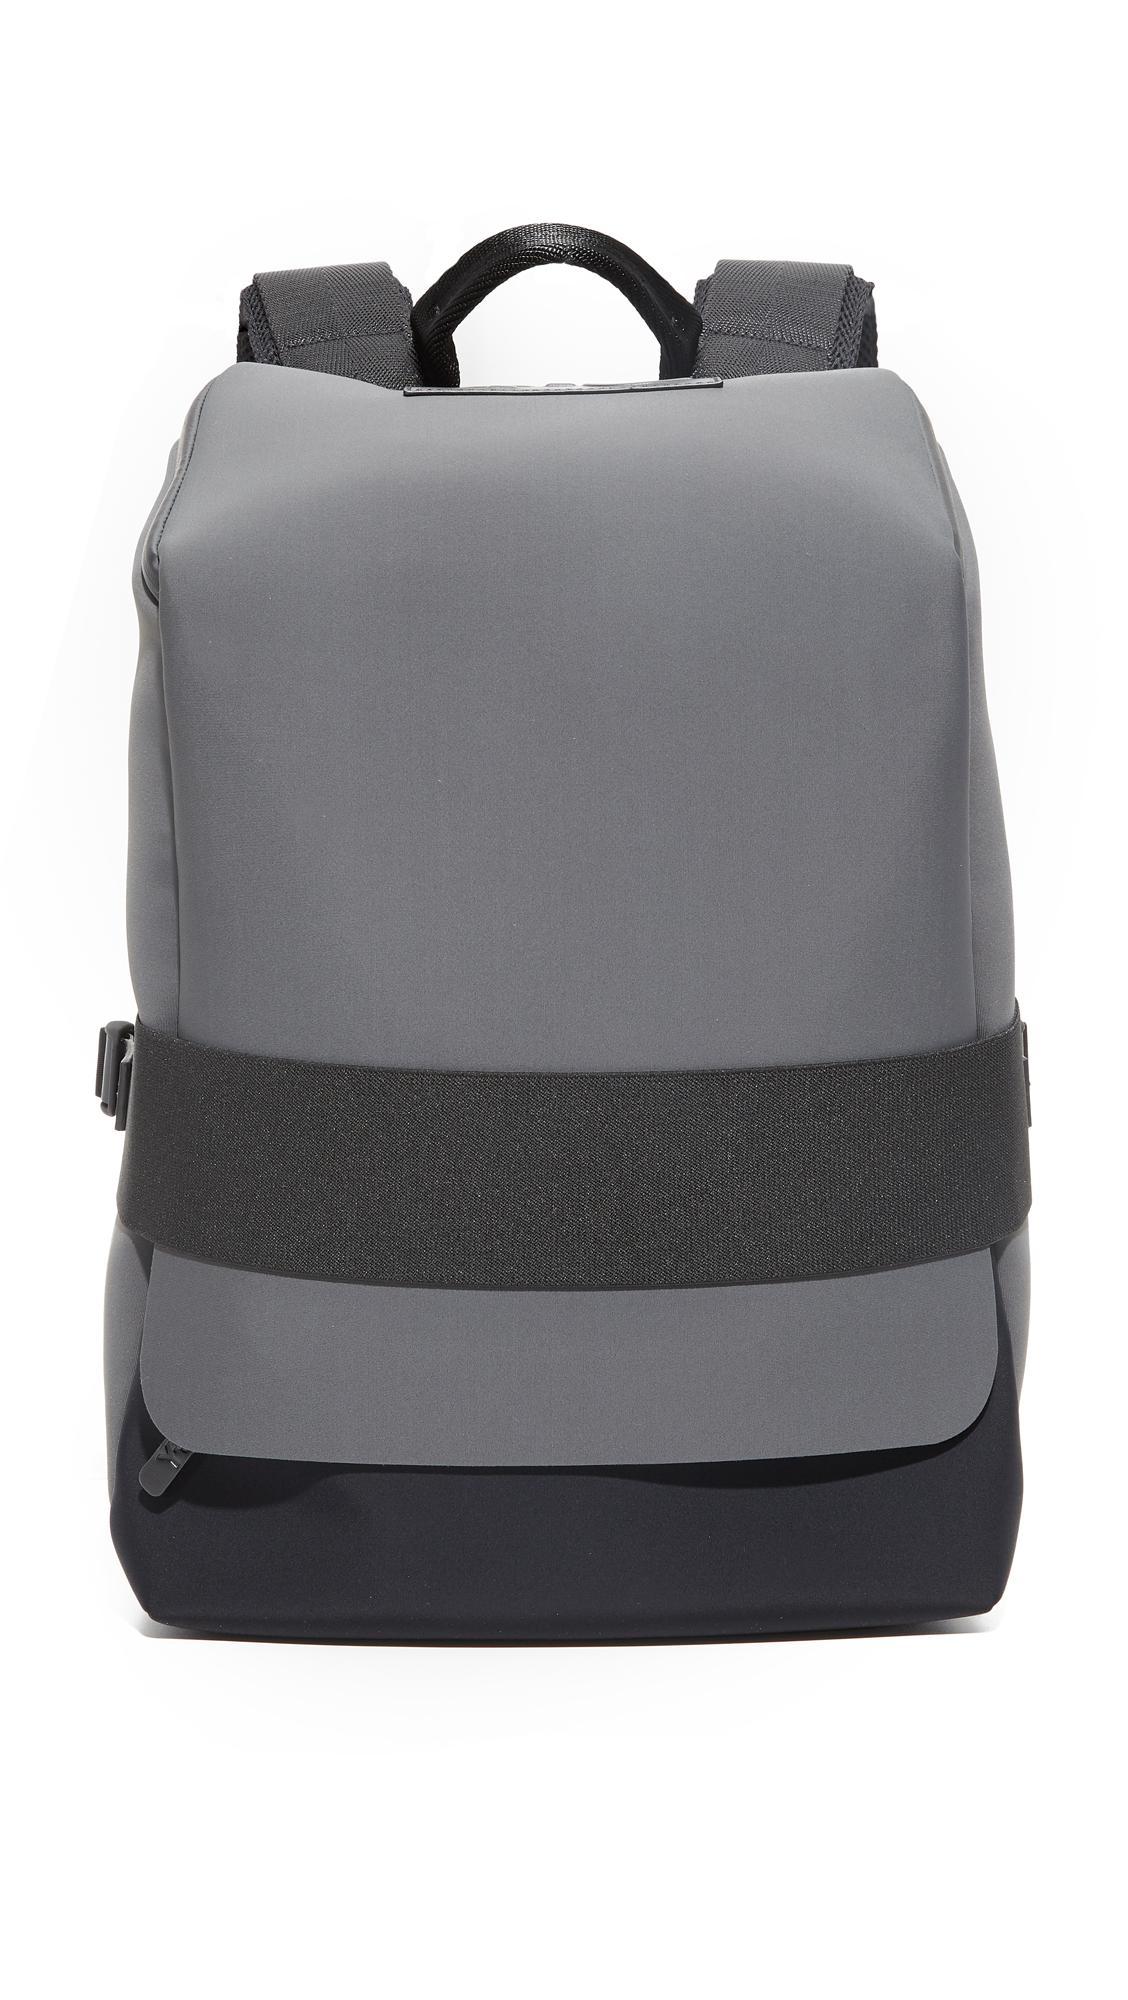 de1b2d874742 Lyst - Y-3 Qasa Backpack Small in Gray for Men